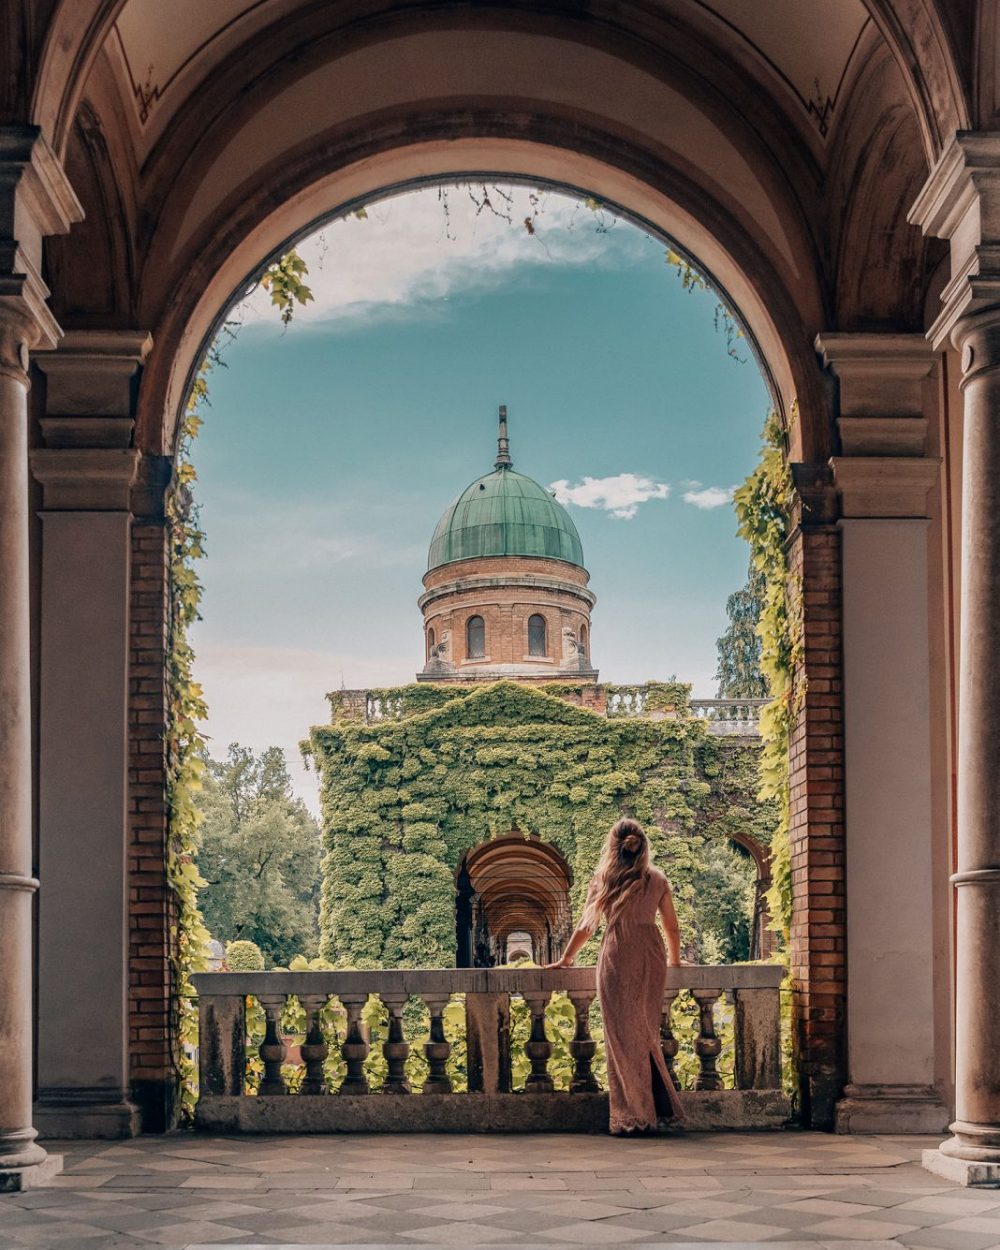 16 Best Things To Do In Zagreb Croatia In 2020 Croatia Travel Zagreb Croatia Croatia